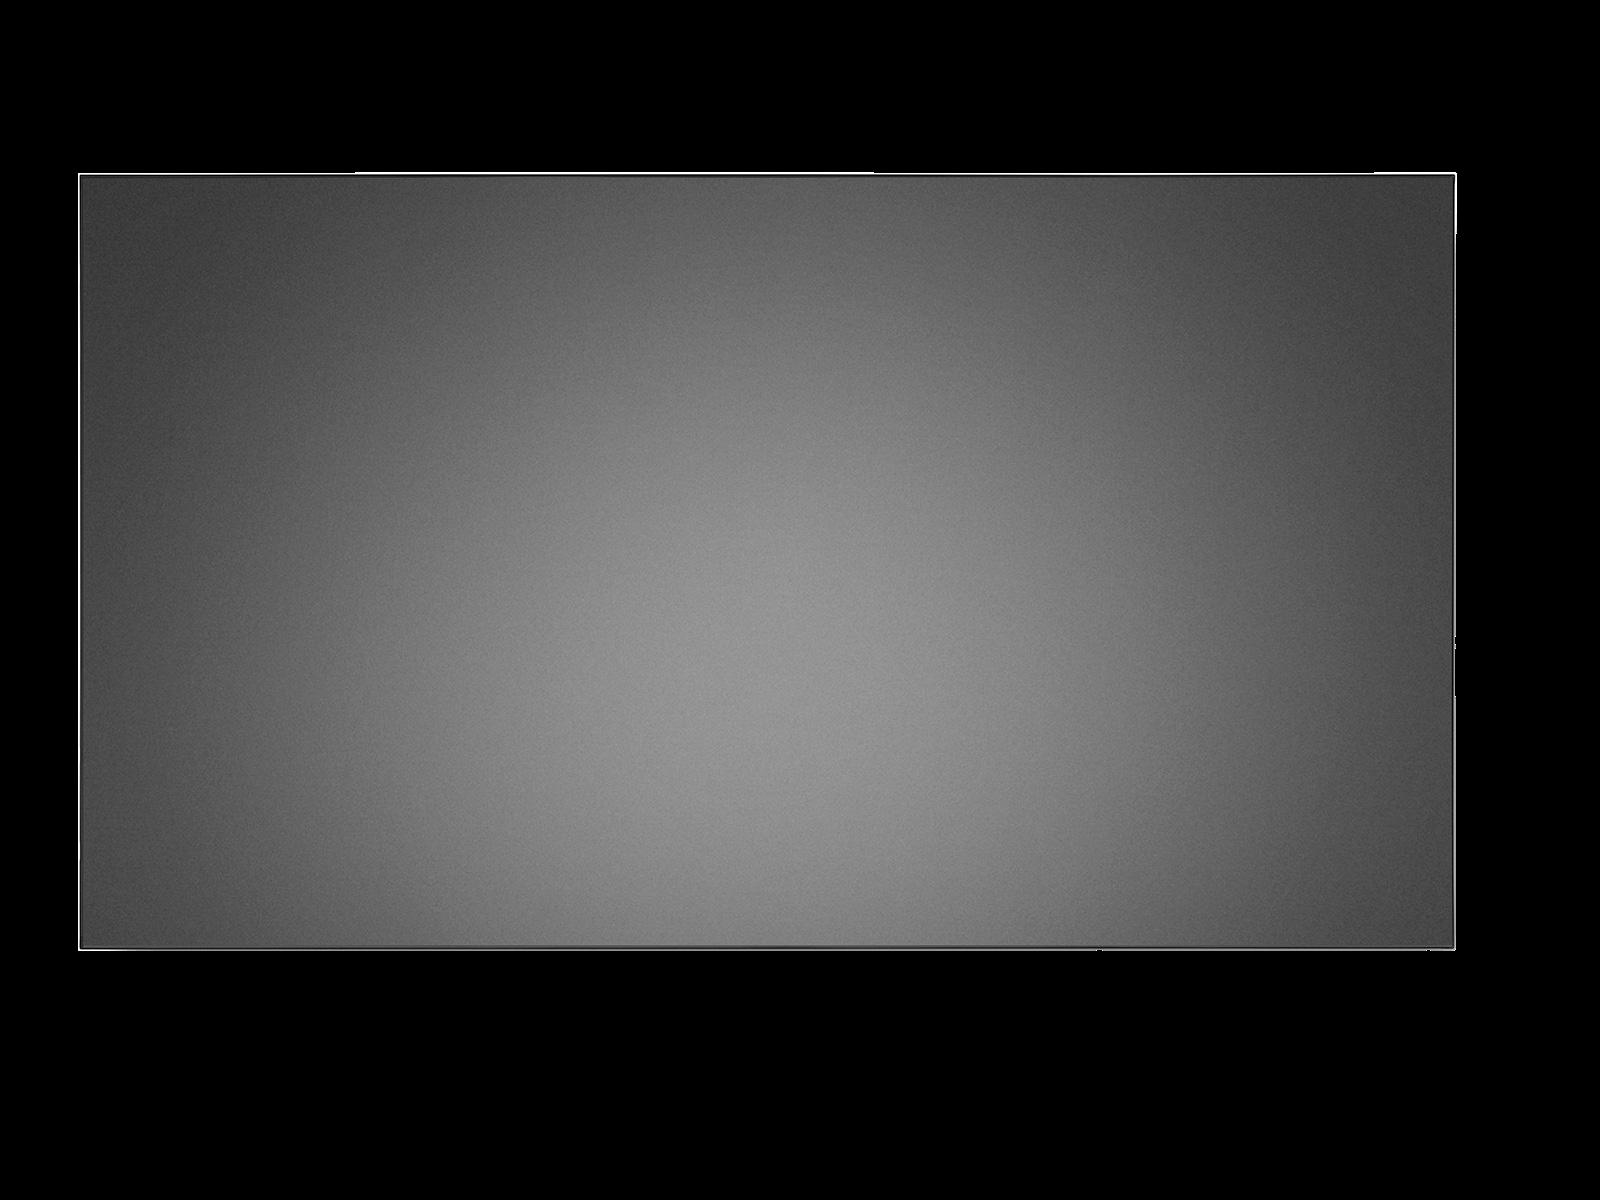 NEC_UN462A_HO_blank_1600x1200-5 (1)